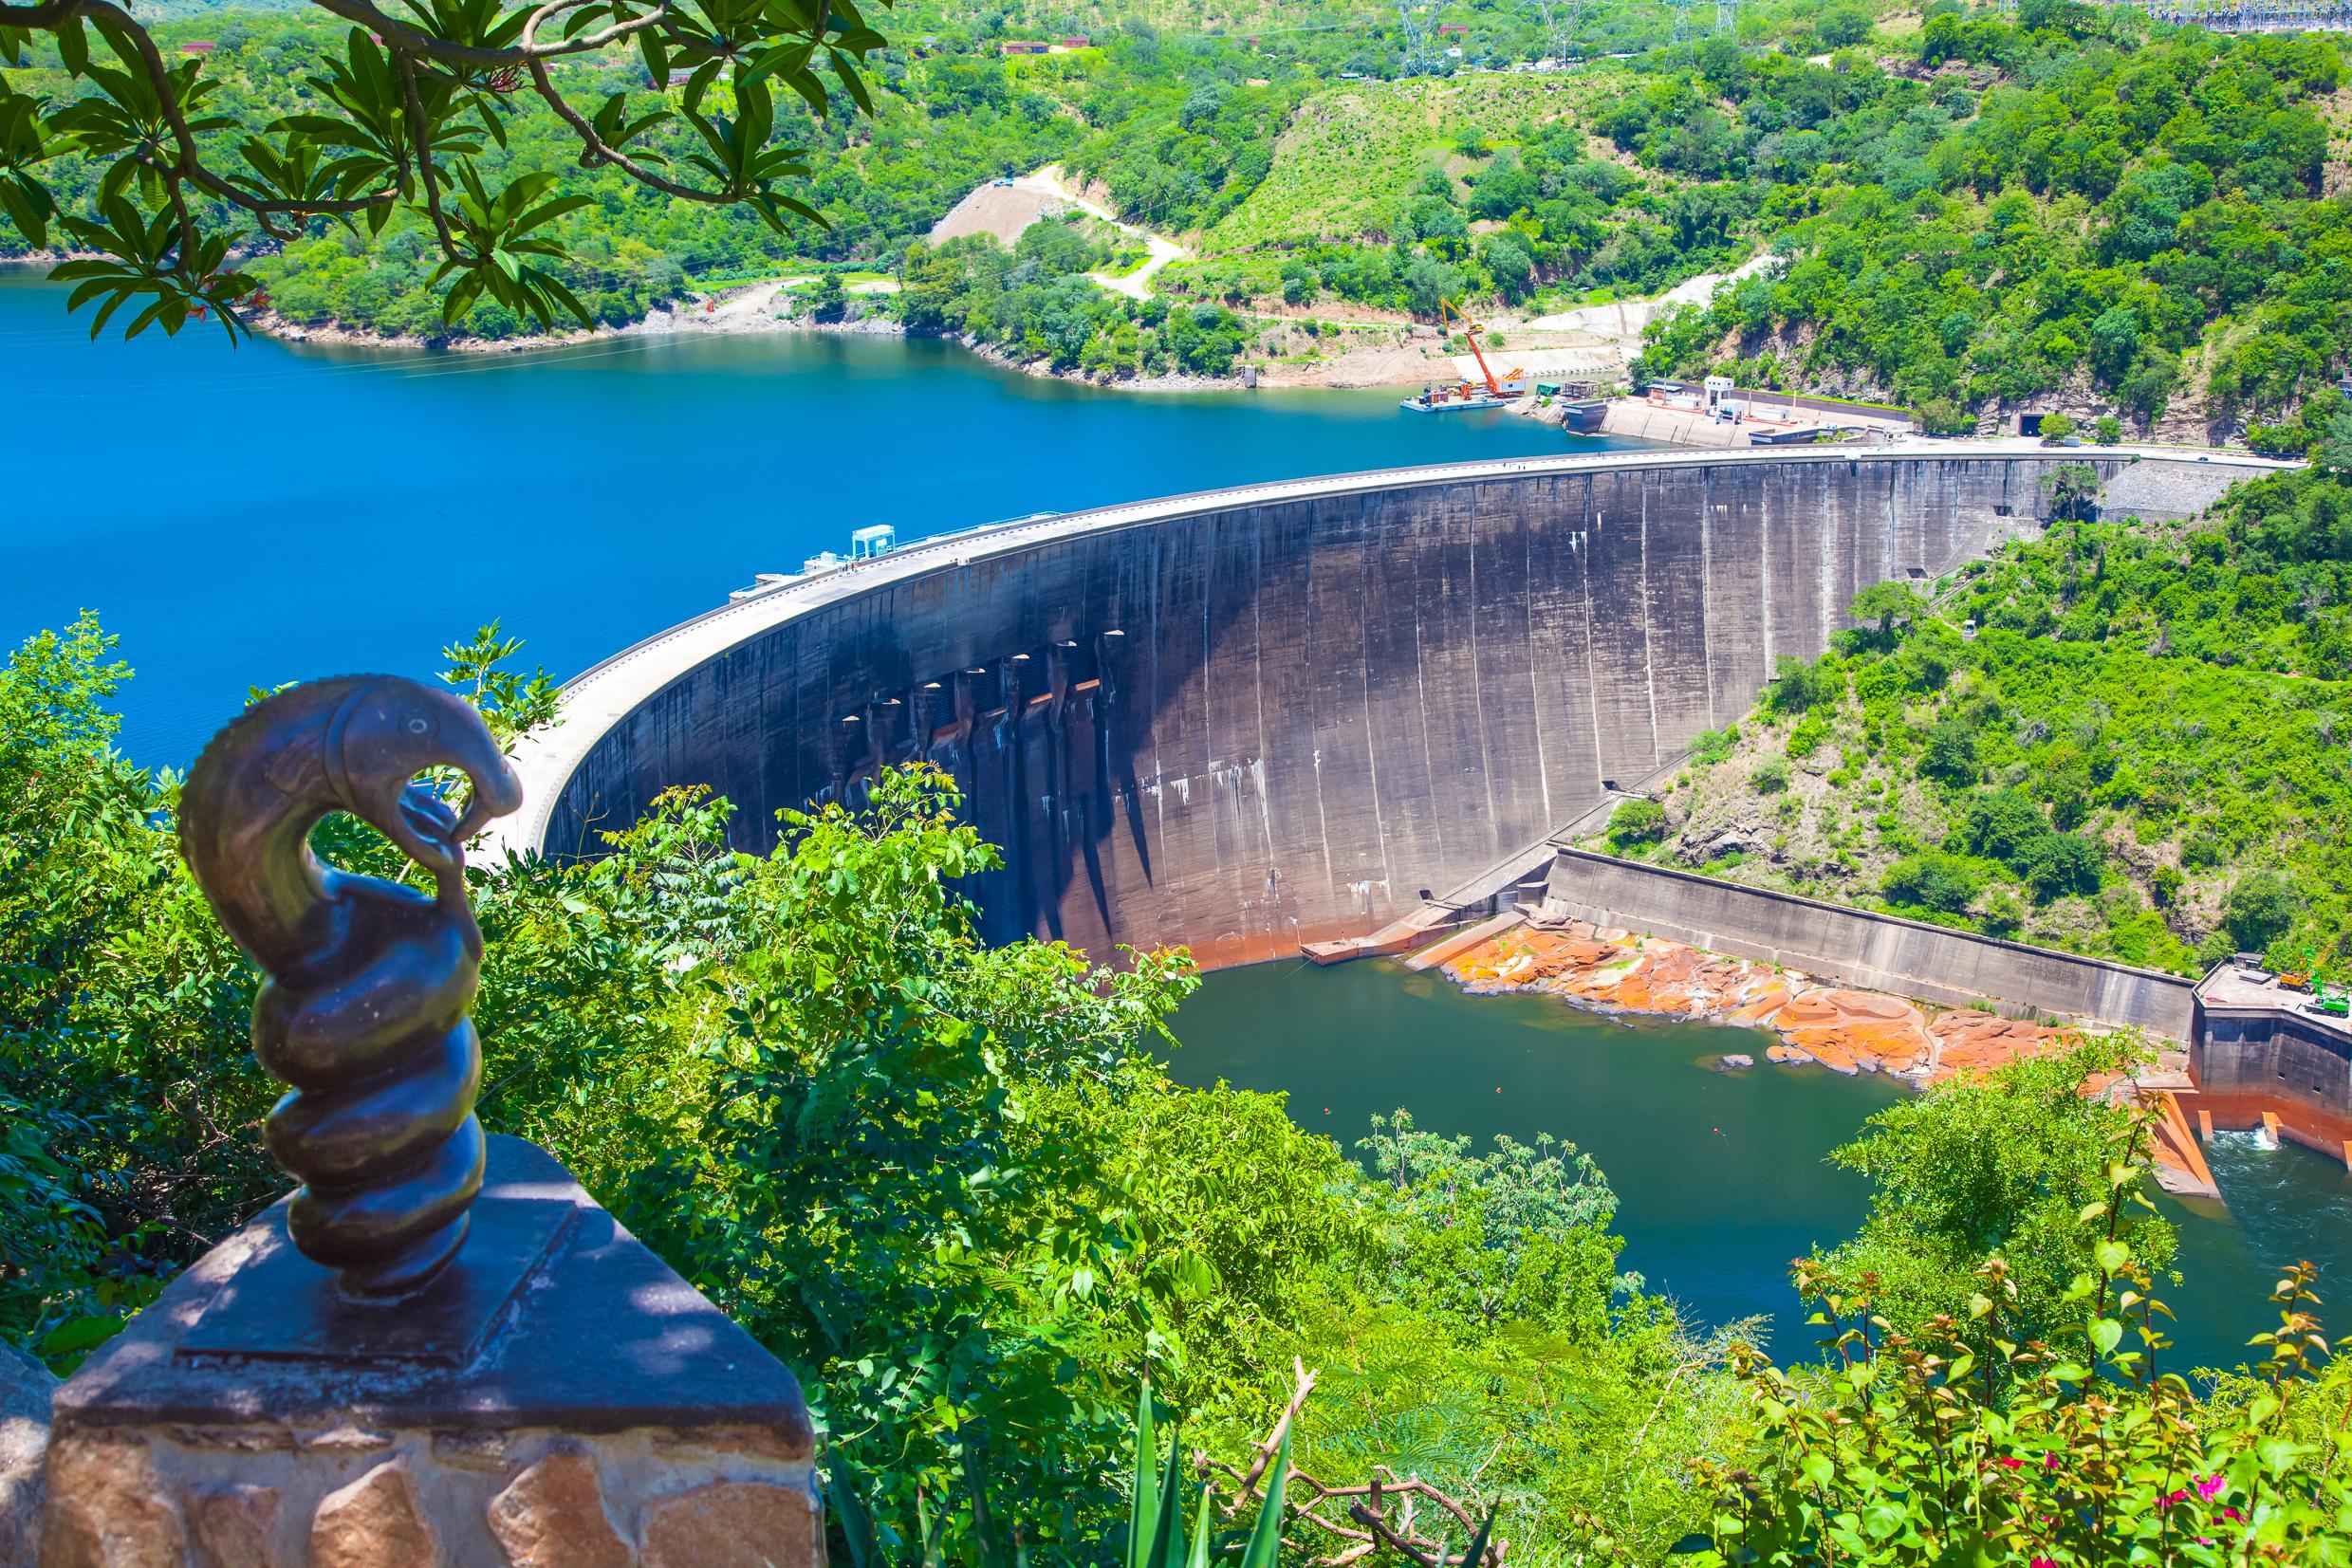 nyami-nyami_Zimbabwe-Afrika-AdobeStock_133452708.jpeg